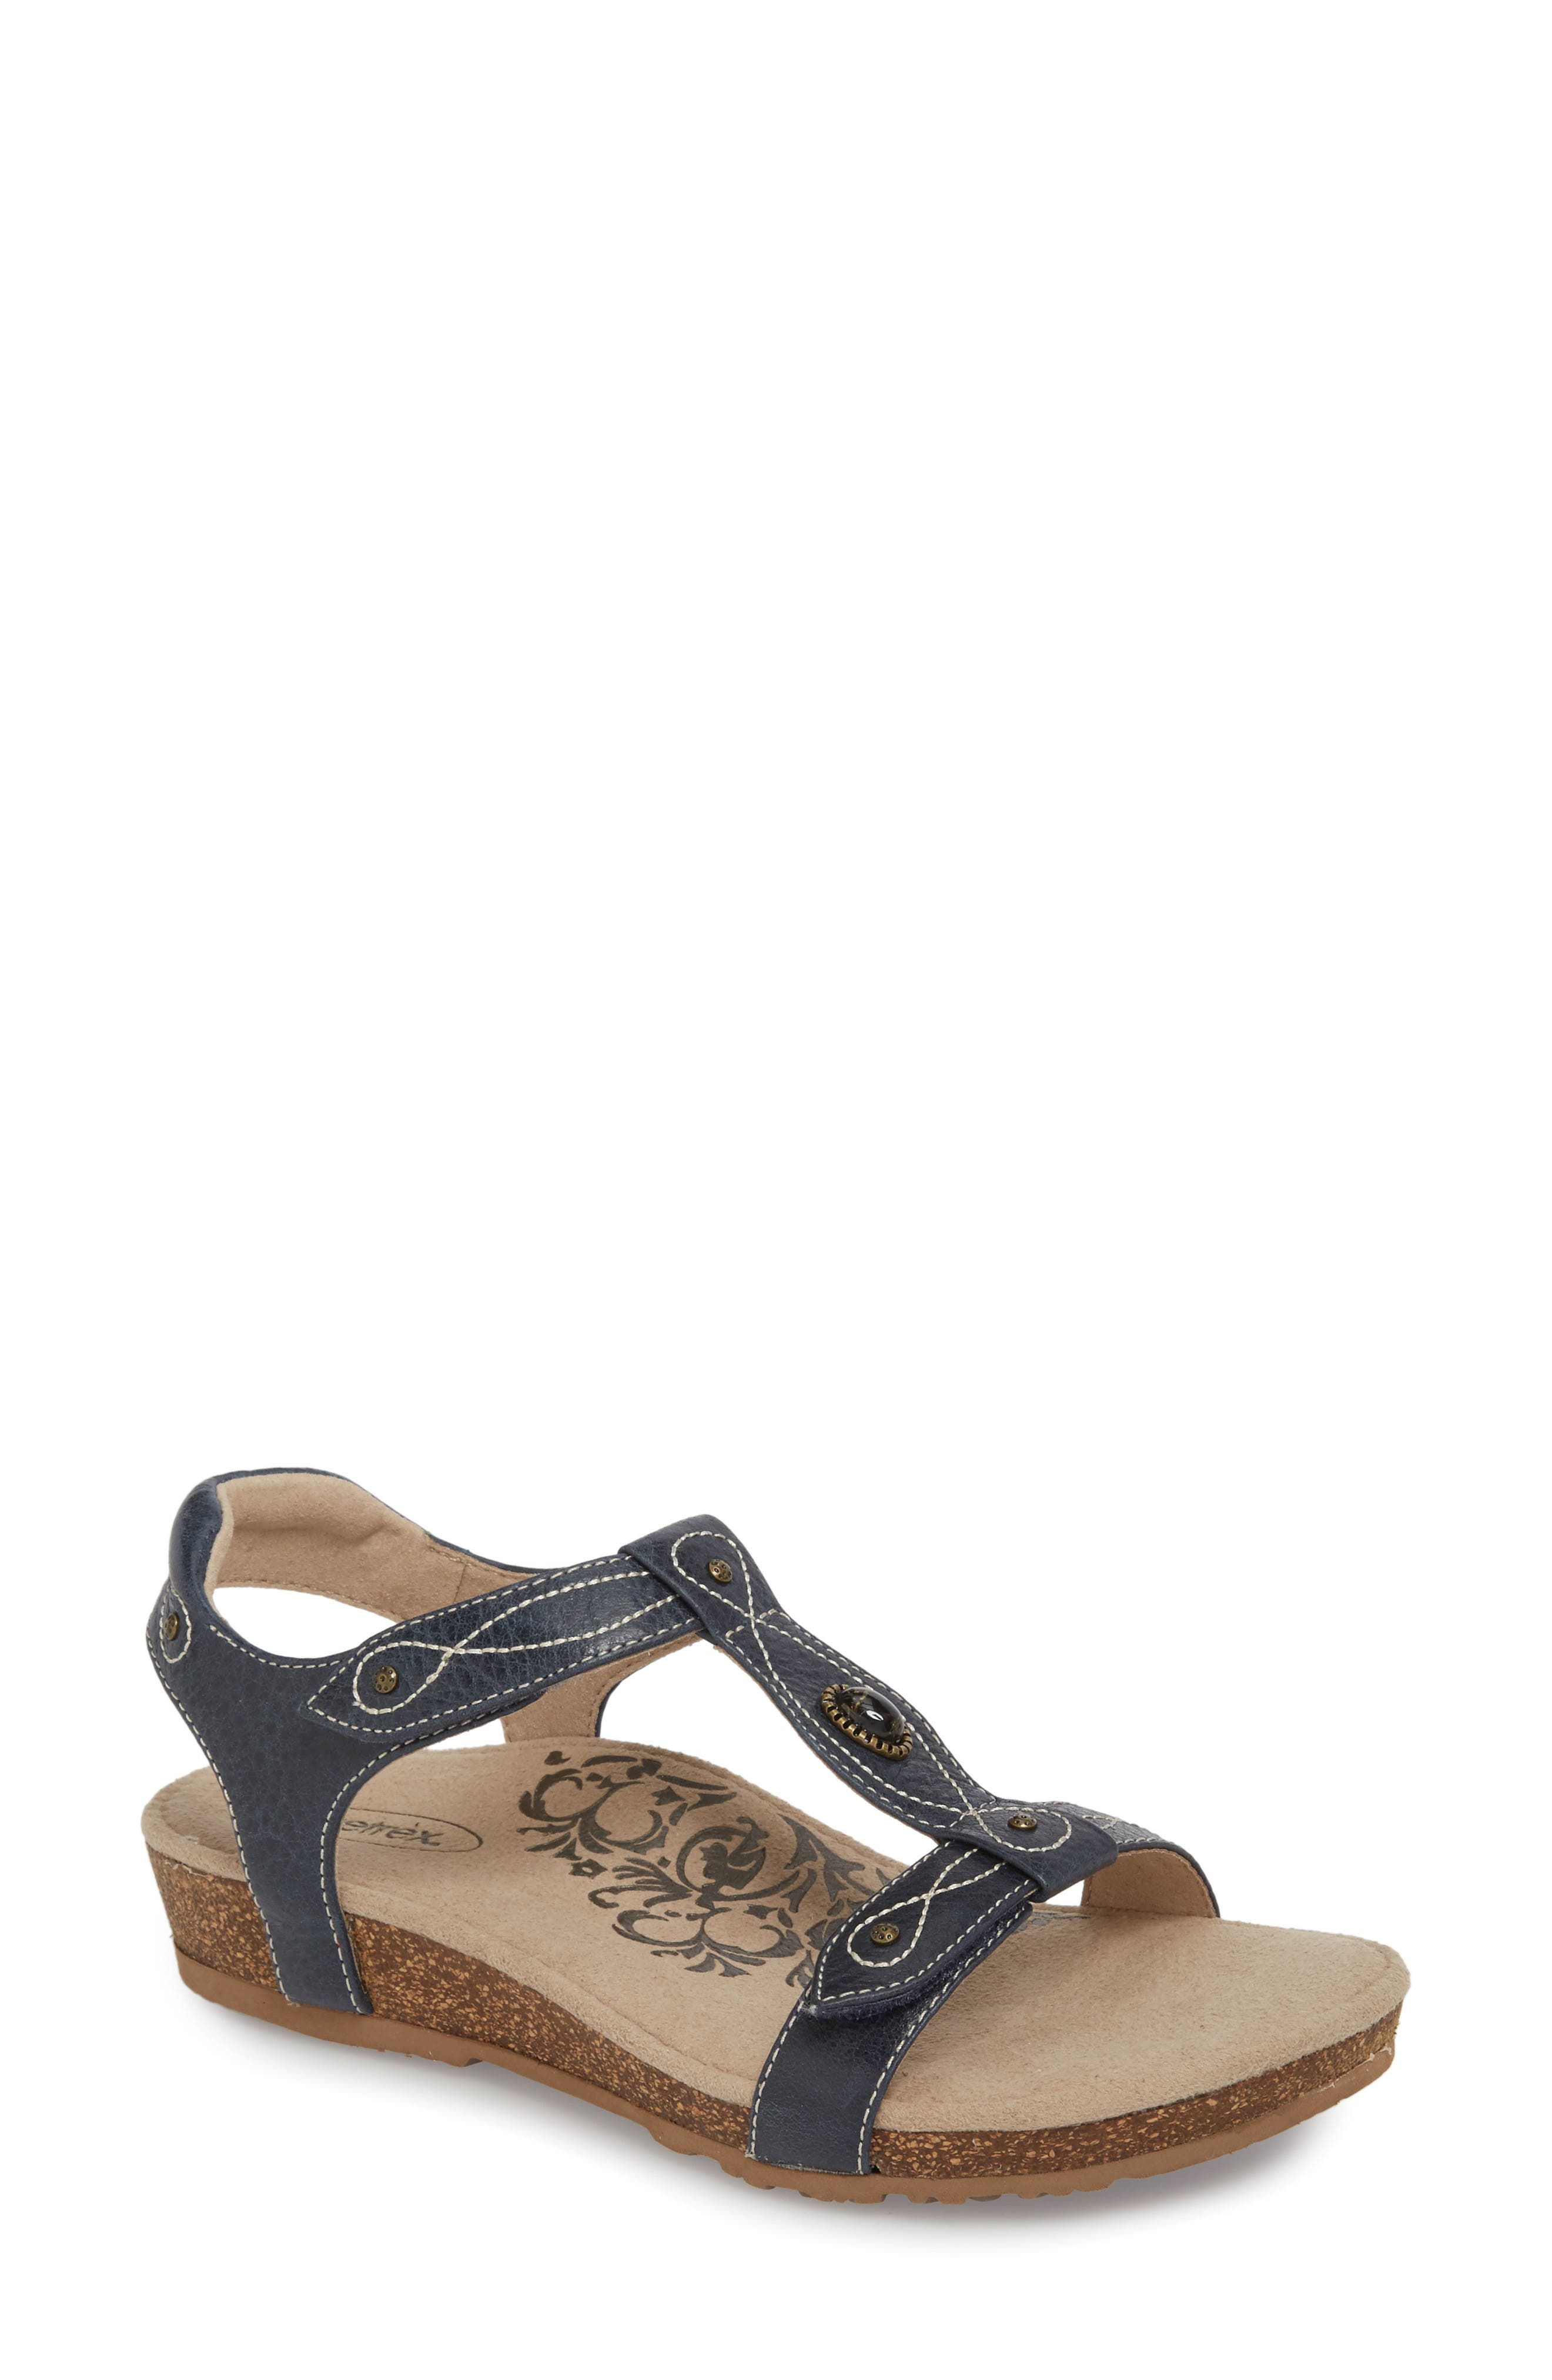 'Lori' Sandal,                         Main,                         color, Navy Leather